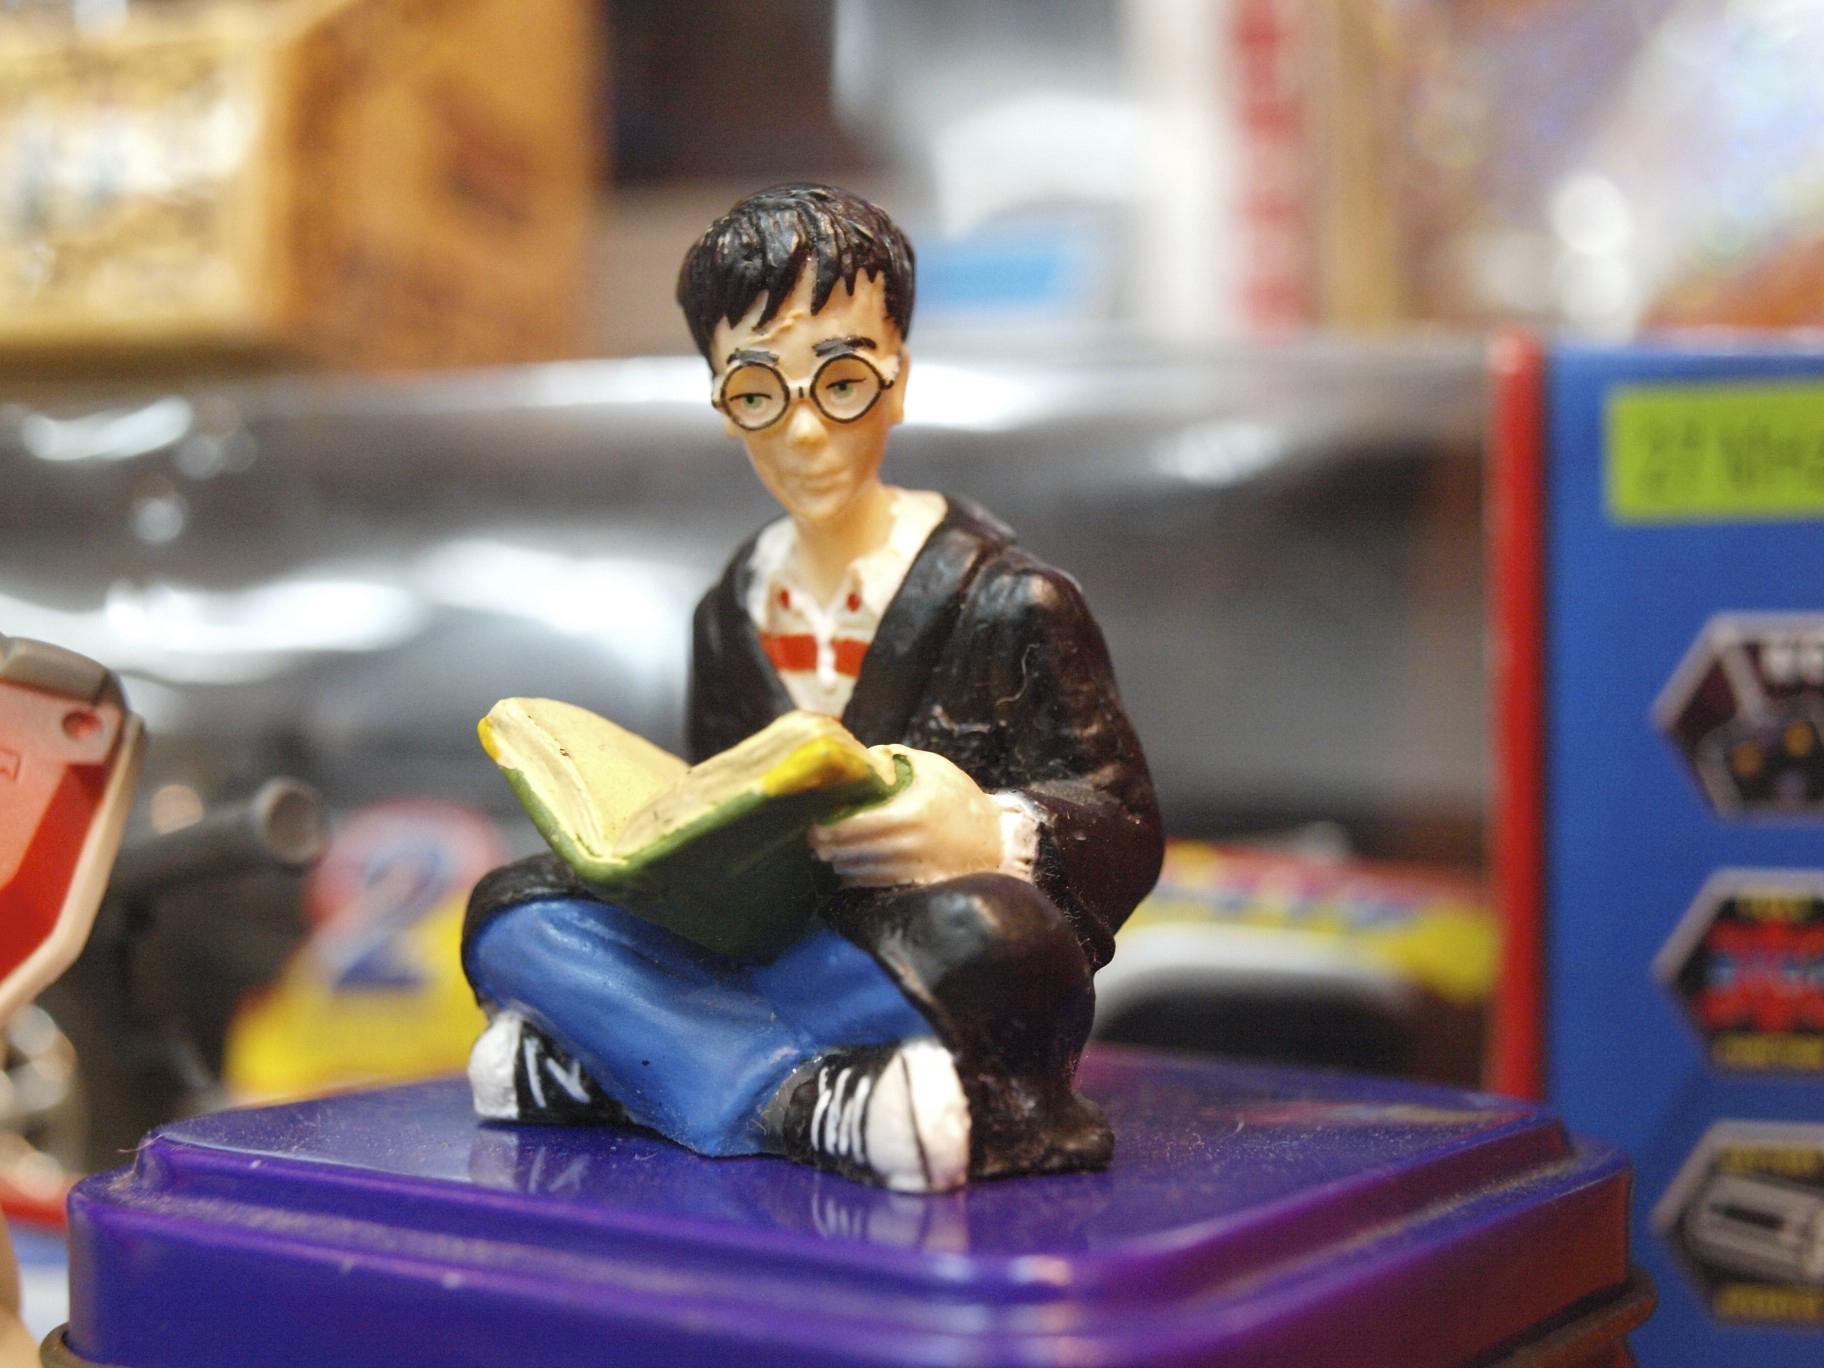 Harry Potter, Character, Macro, Magician, Potter, HQ Photo